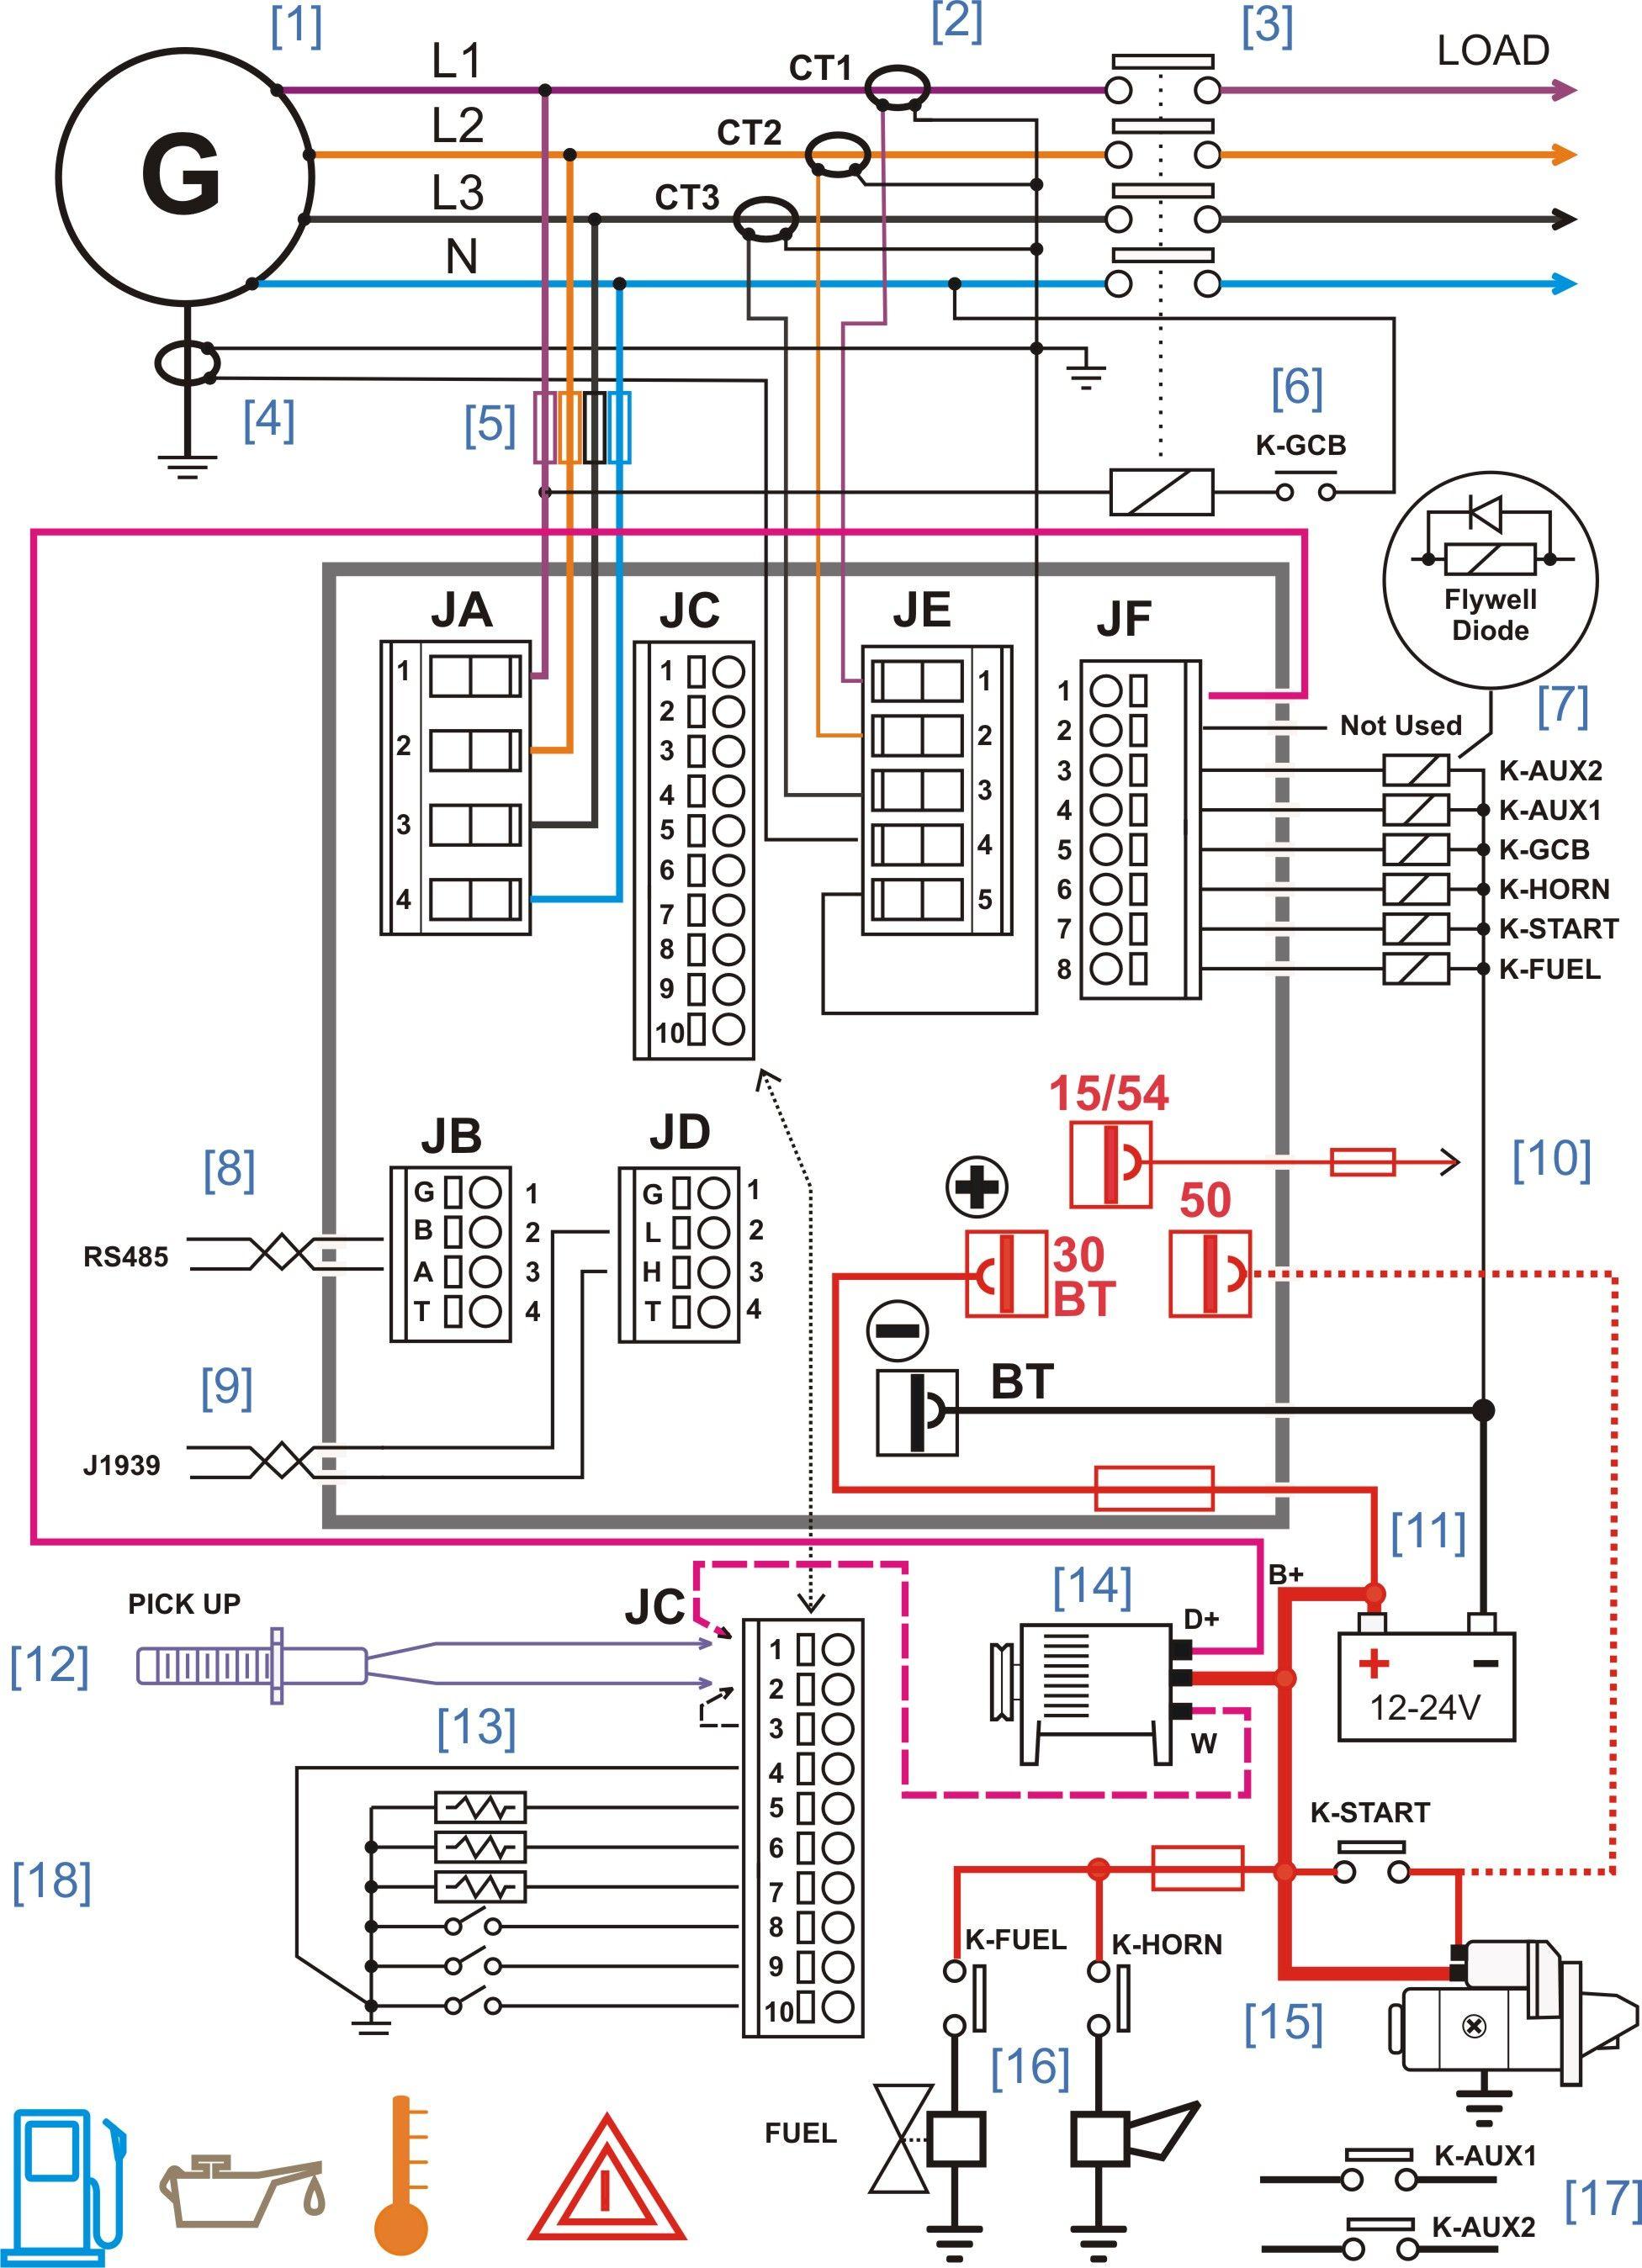 Marine Electrical Control Panel Wiring Diagram | Manual E-Books - Electrical Panel Wiring Diagram